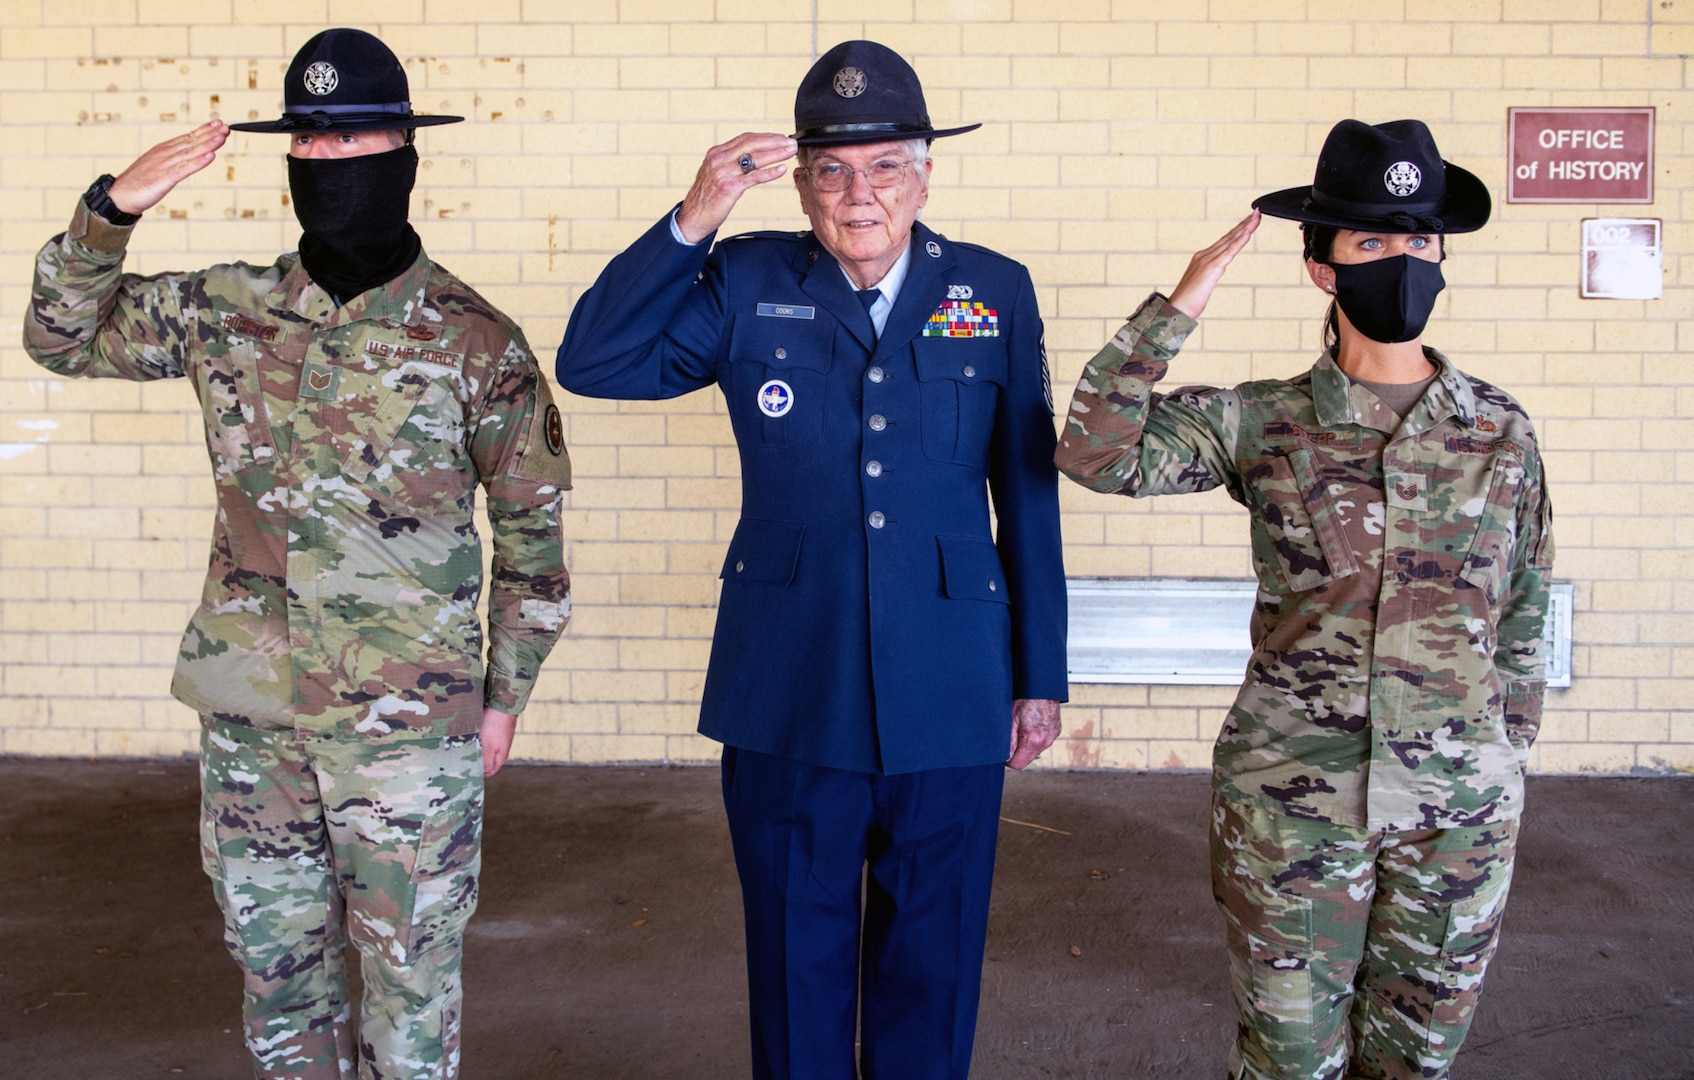 Senior Master Sgt. Thomas Coons